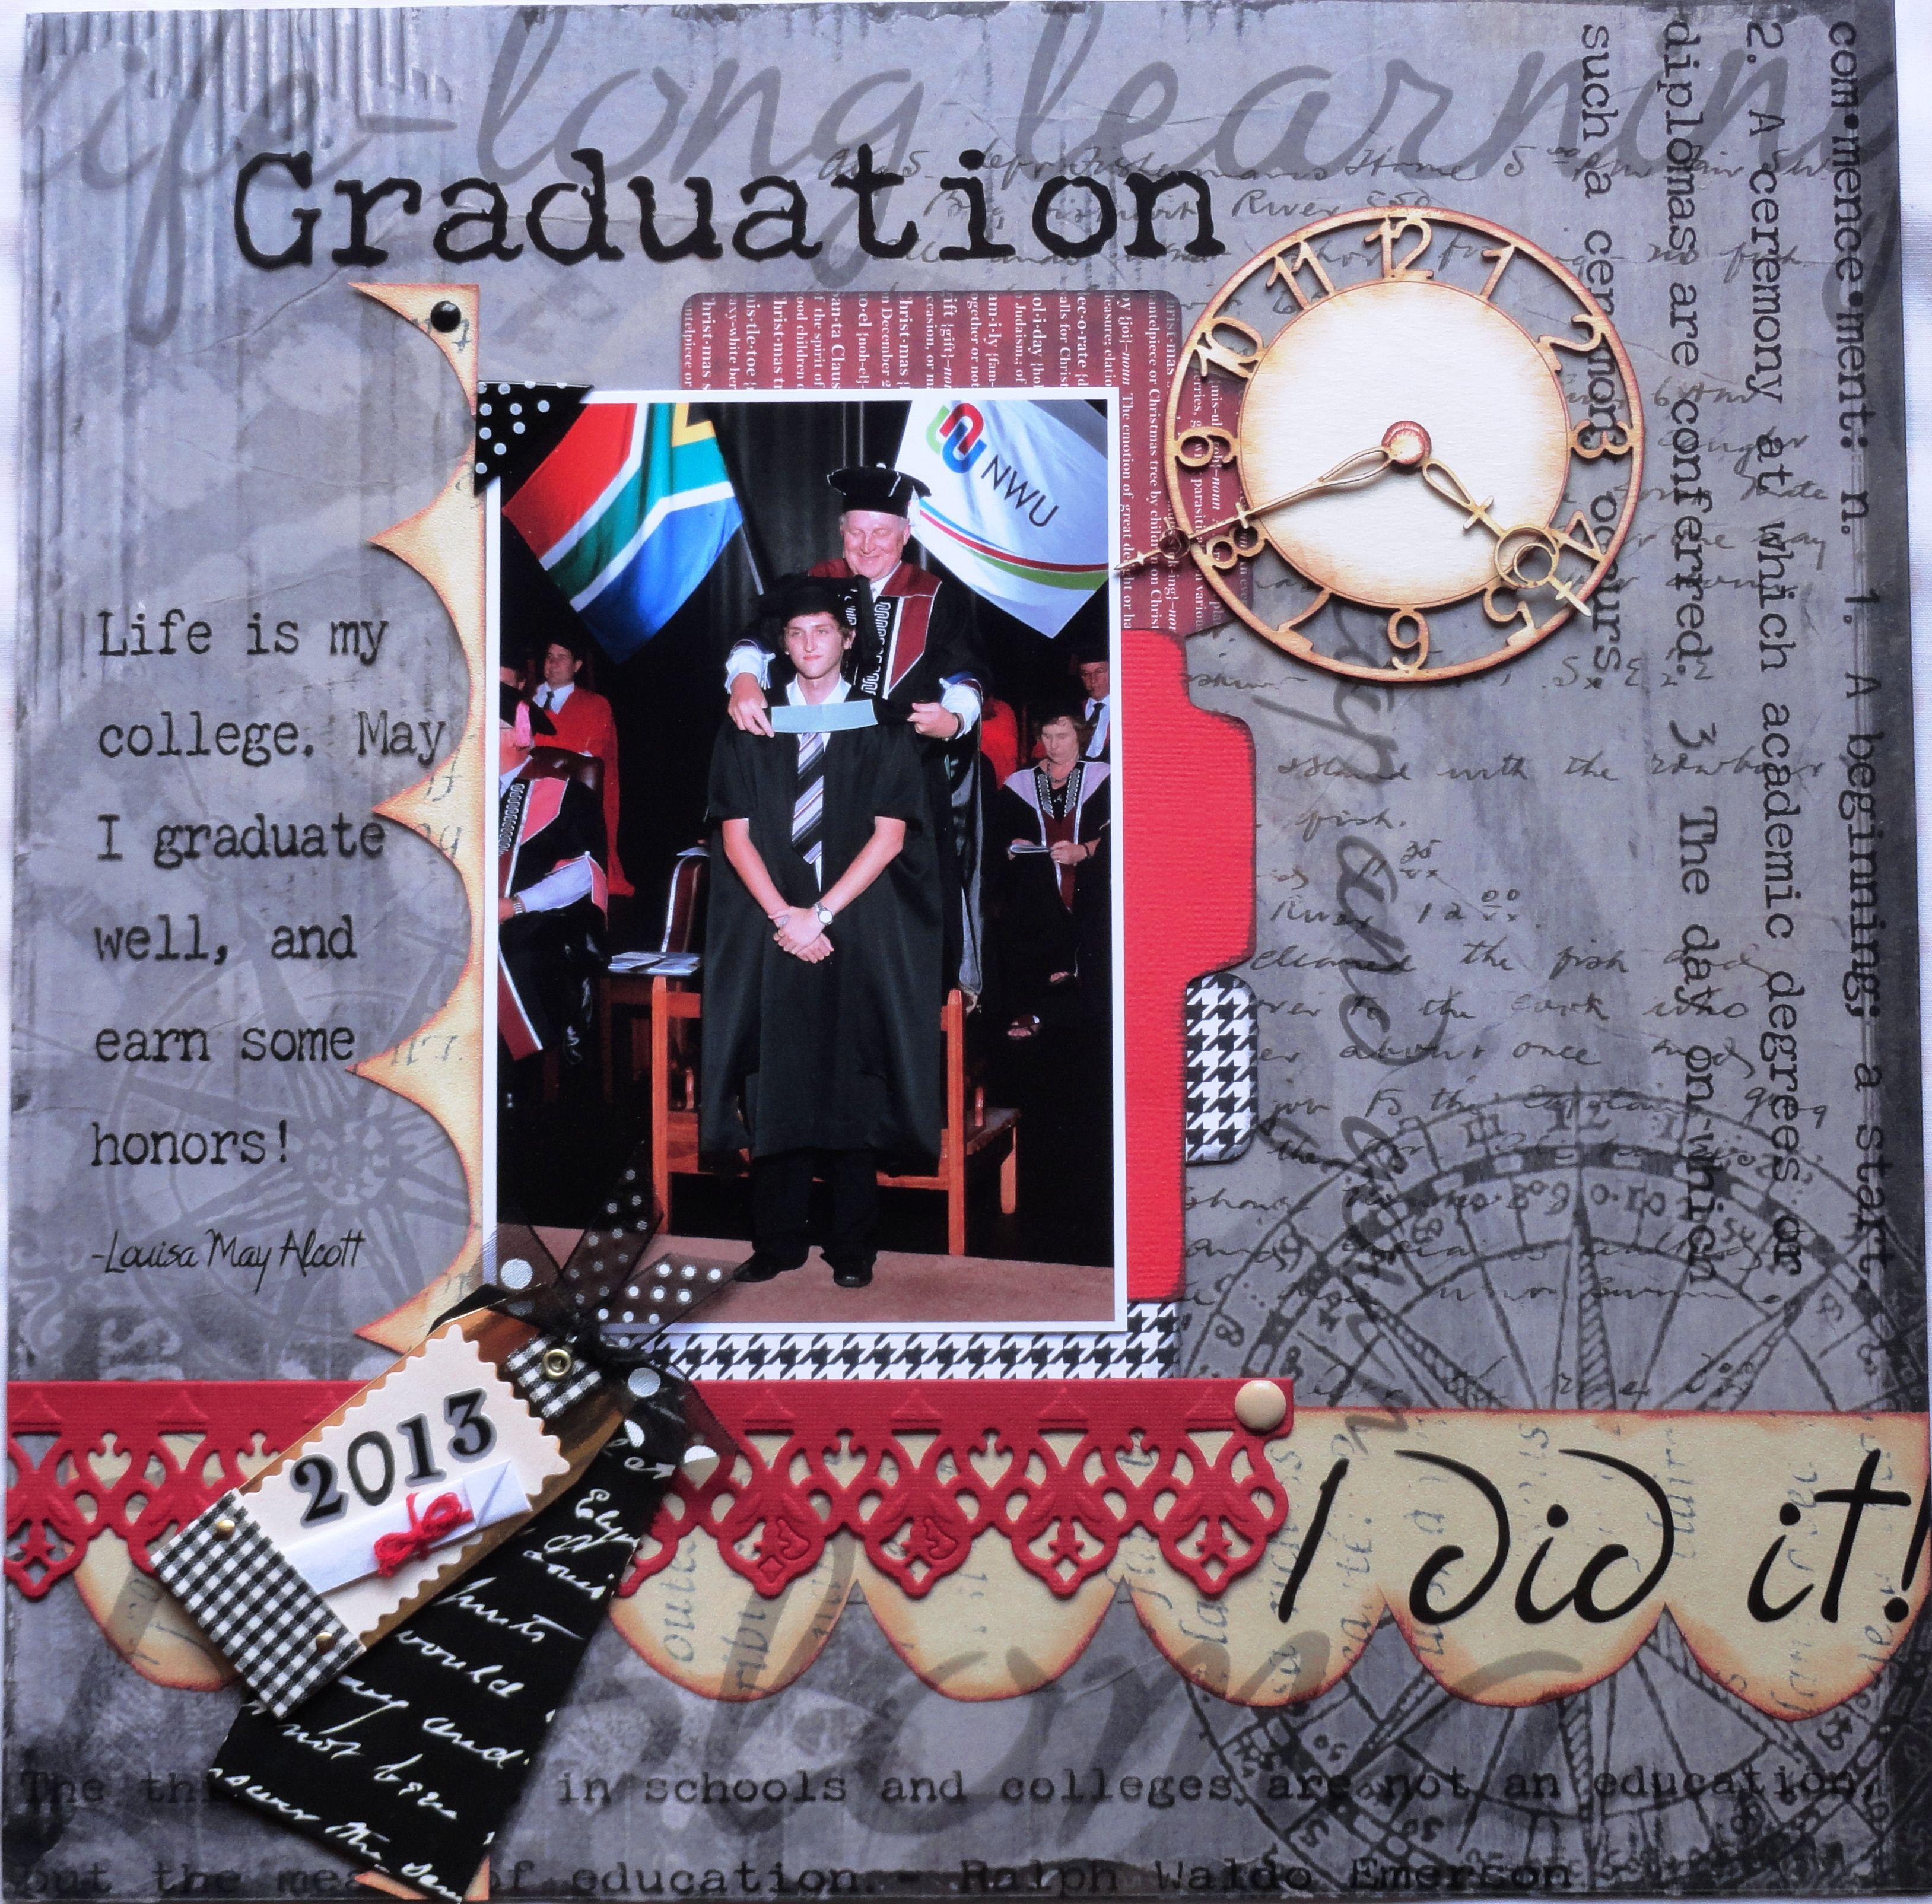 Scrapbook ideas graduation - Graduation Layout Scrapbooking Scrapbook Layouts Pinterest 3256x3209 Black White Graduation Scrapbook Layout 640x640